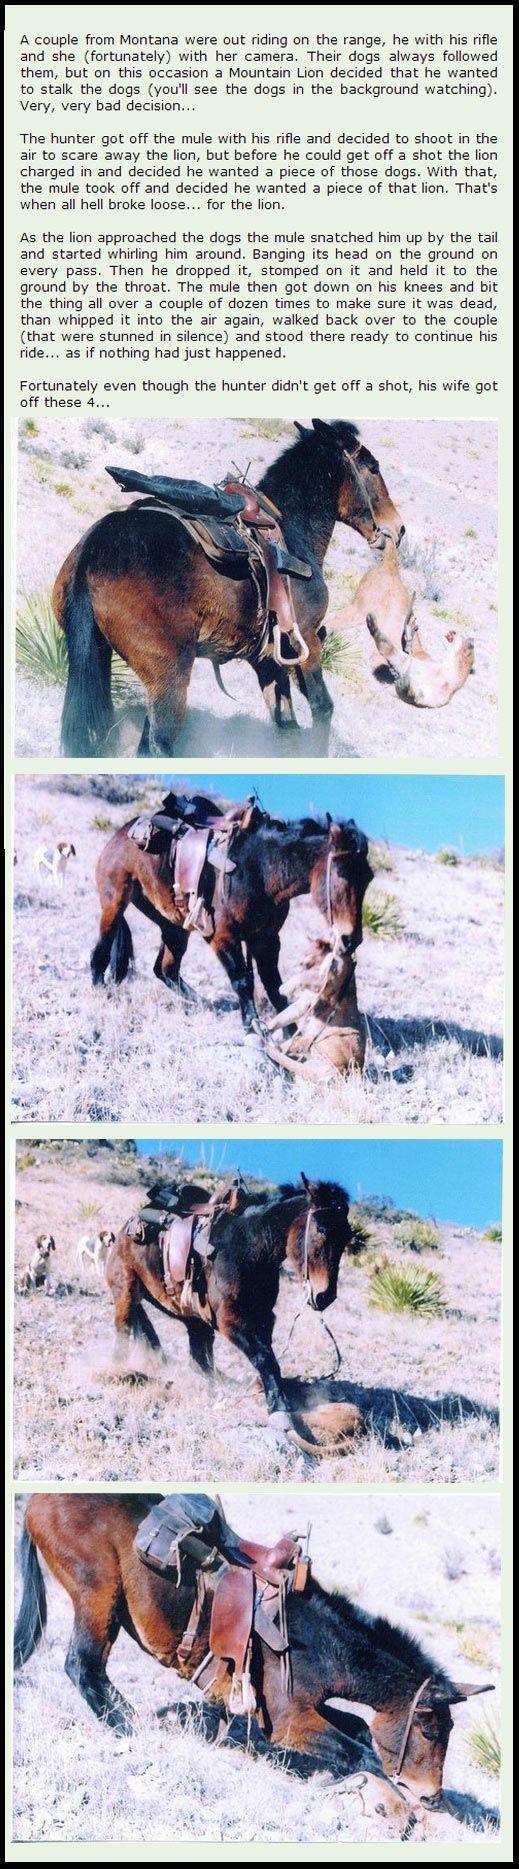 Mules are BAMFs.